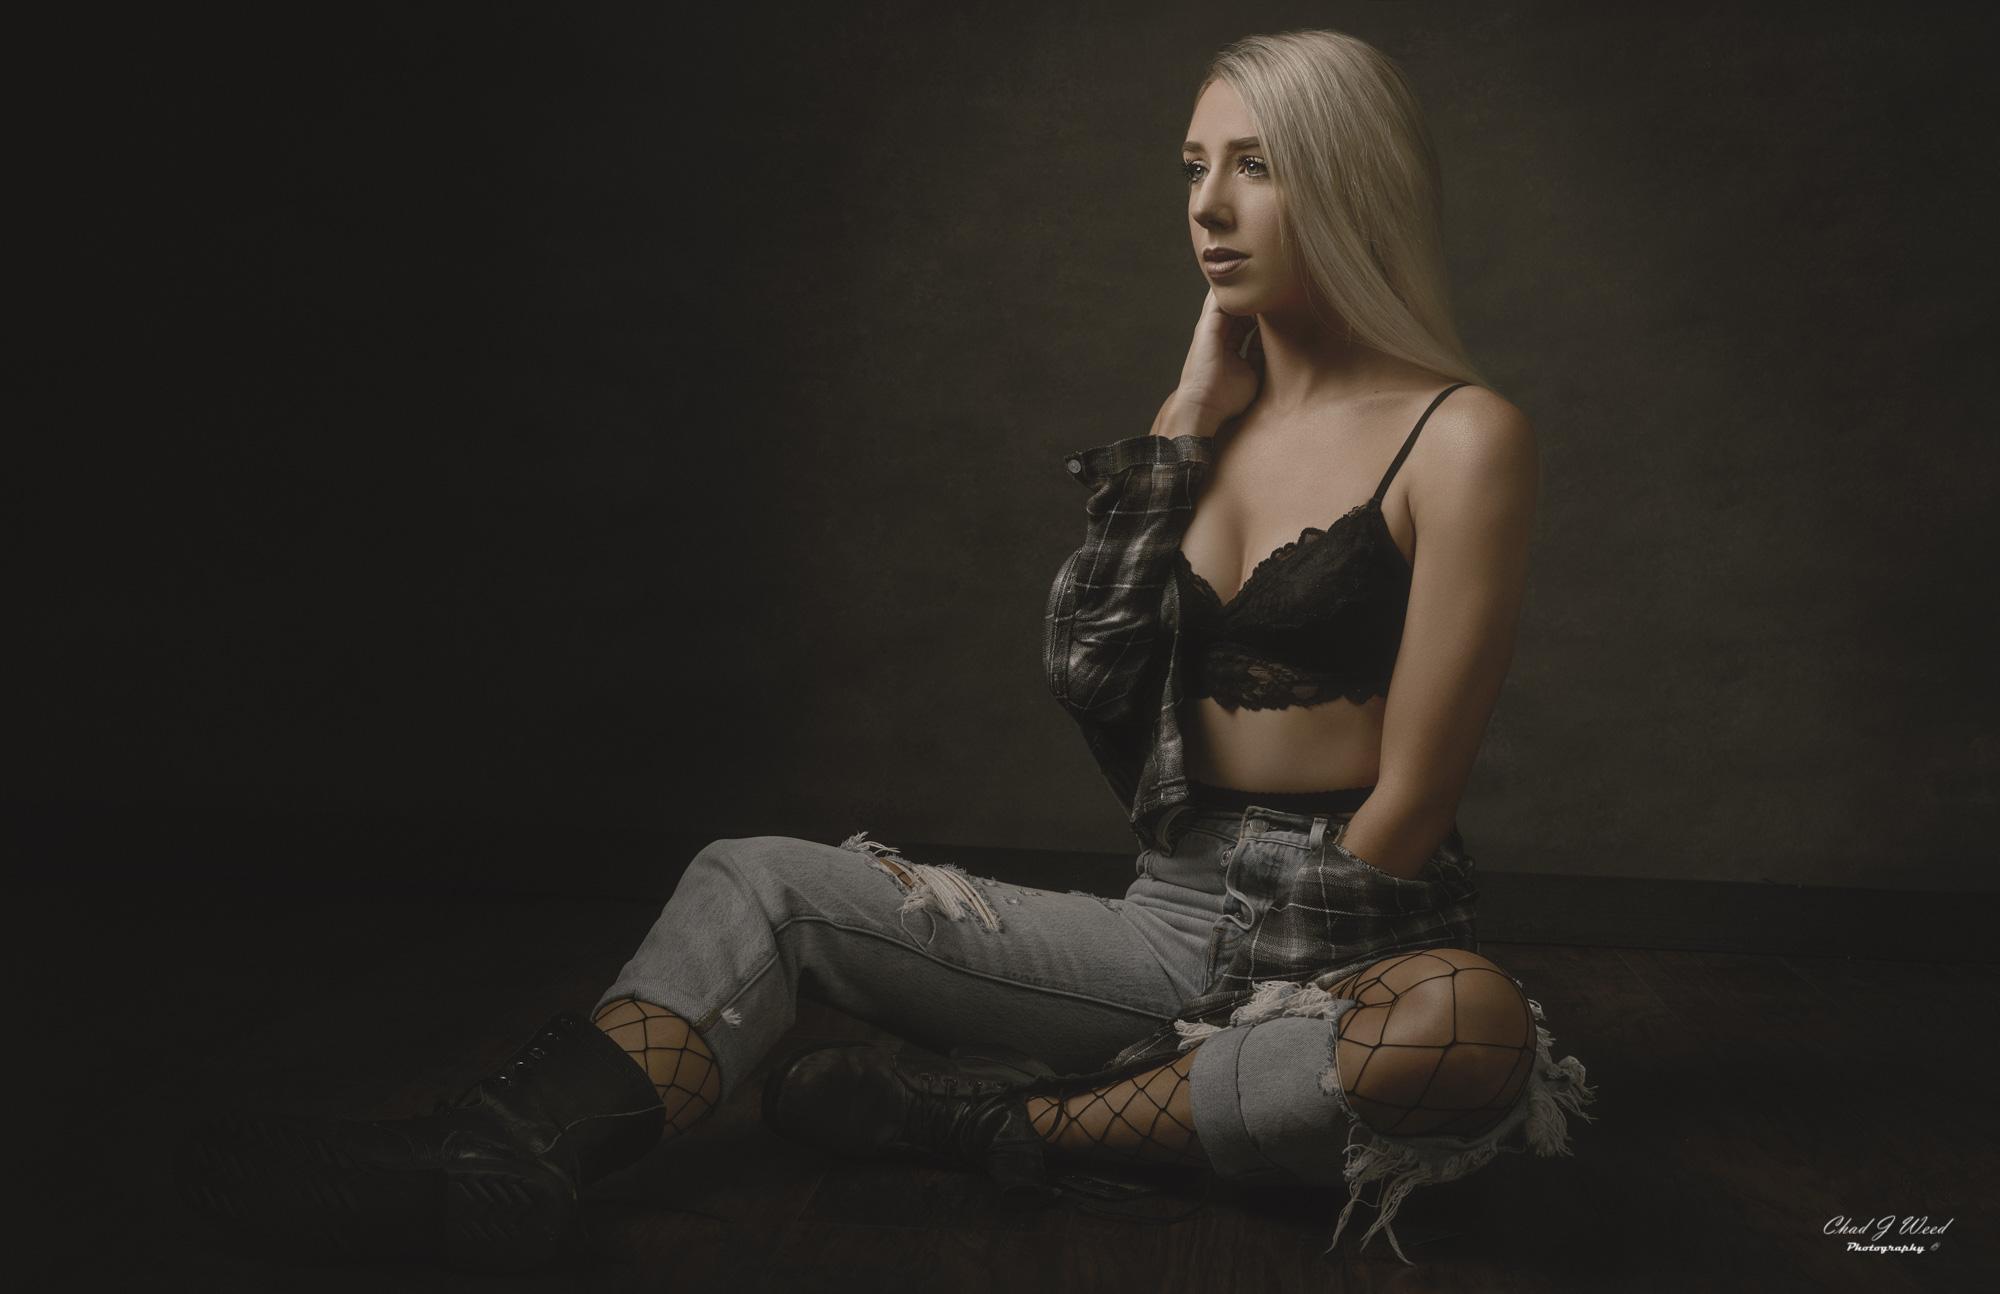 Arizona Portrait Photographer Chad Weed with Arizona Model Ashlyn